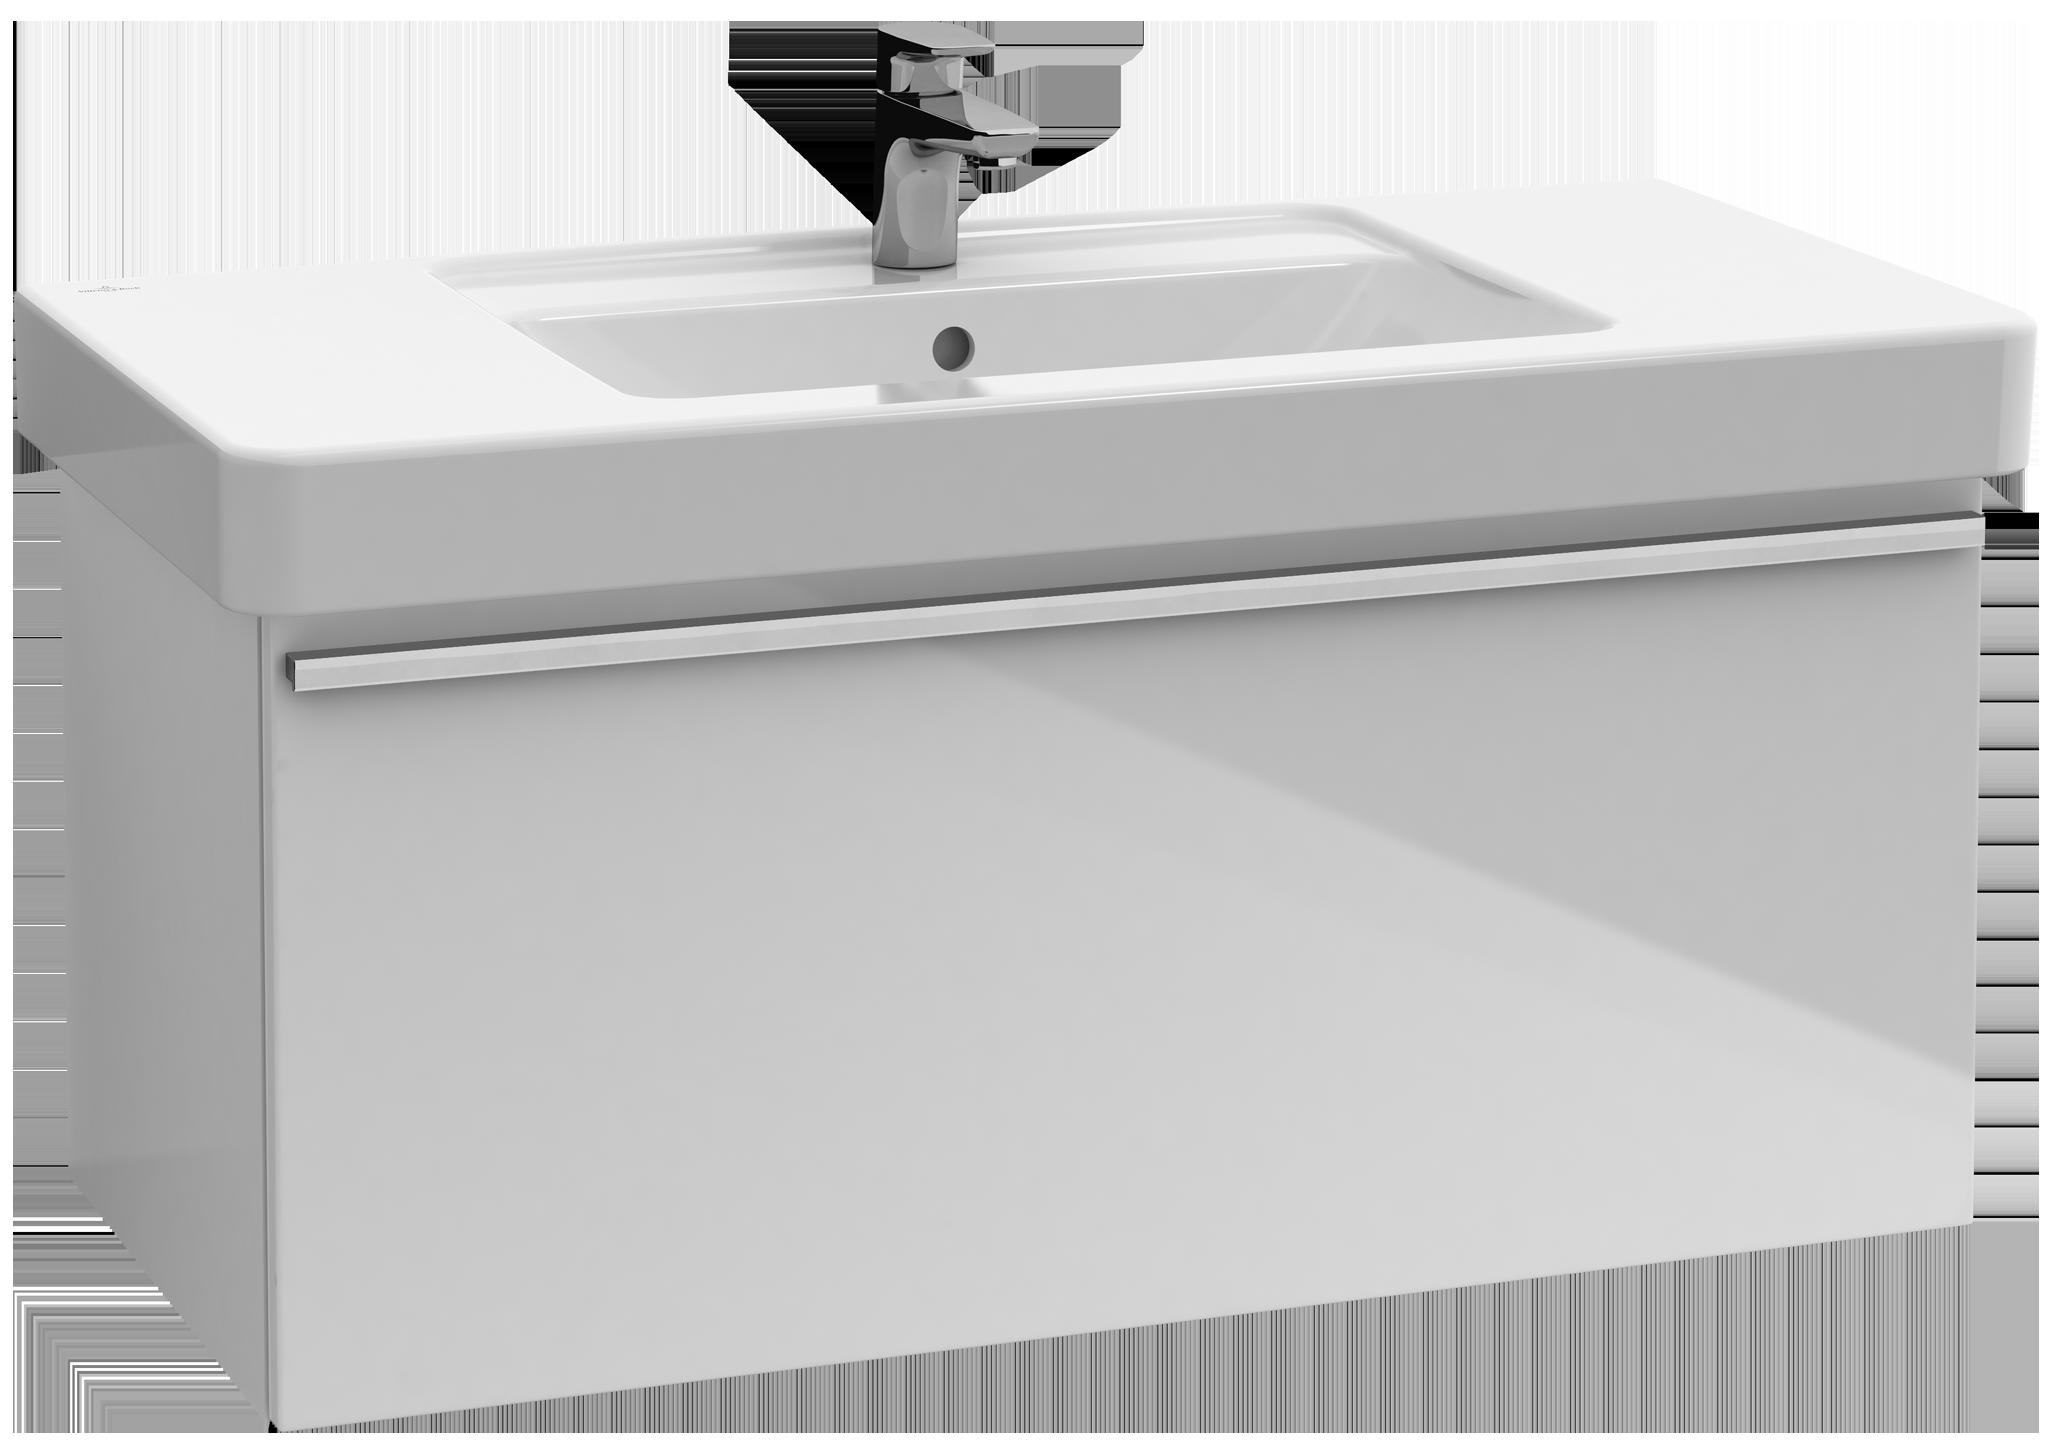 Central line meuble sous lavabo a273n2 villeroy boch for Meuble sous lavabo fly